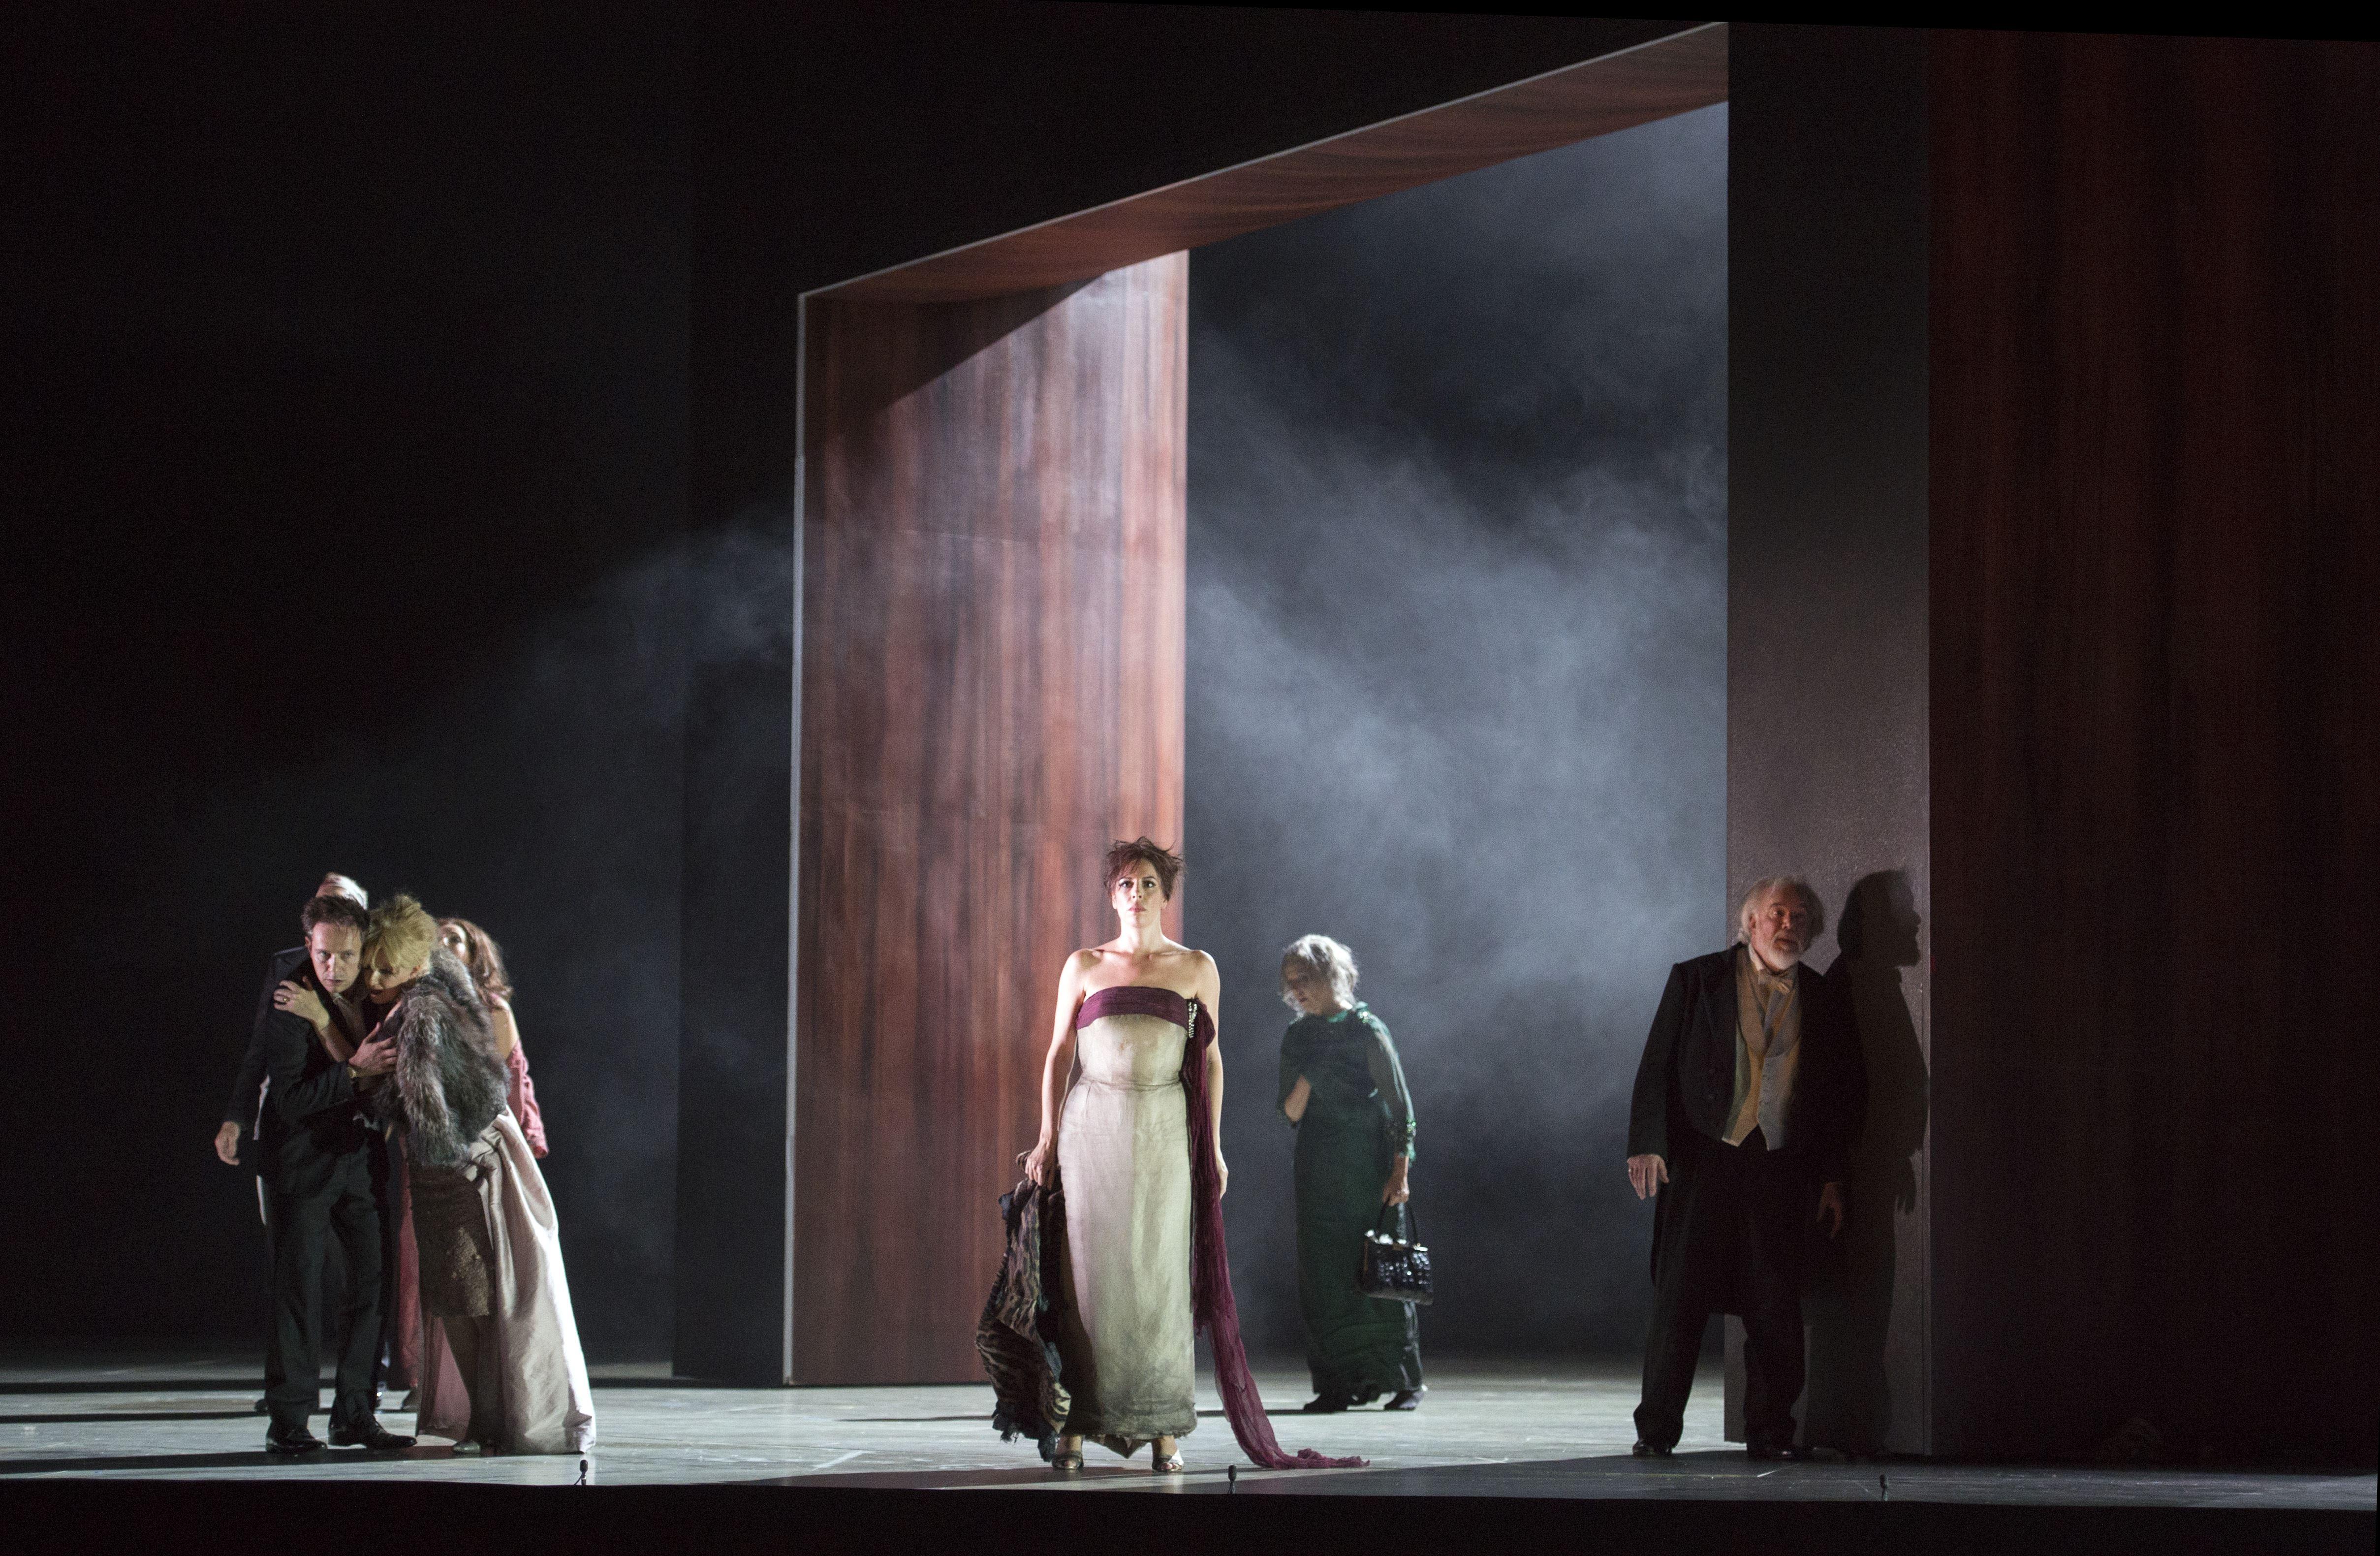 The Metropolitan Opera - The Exterminating Angel